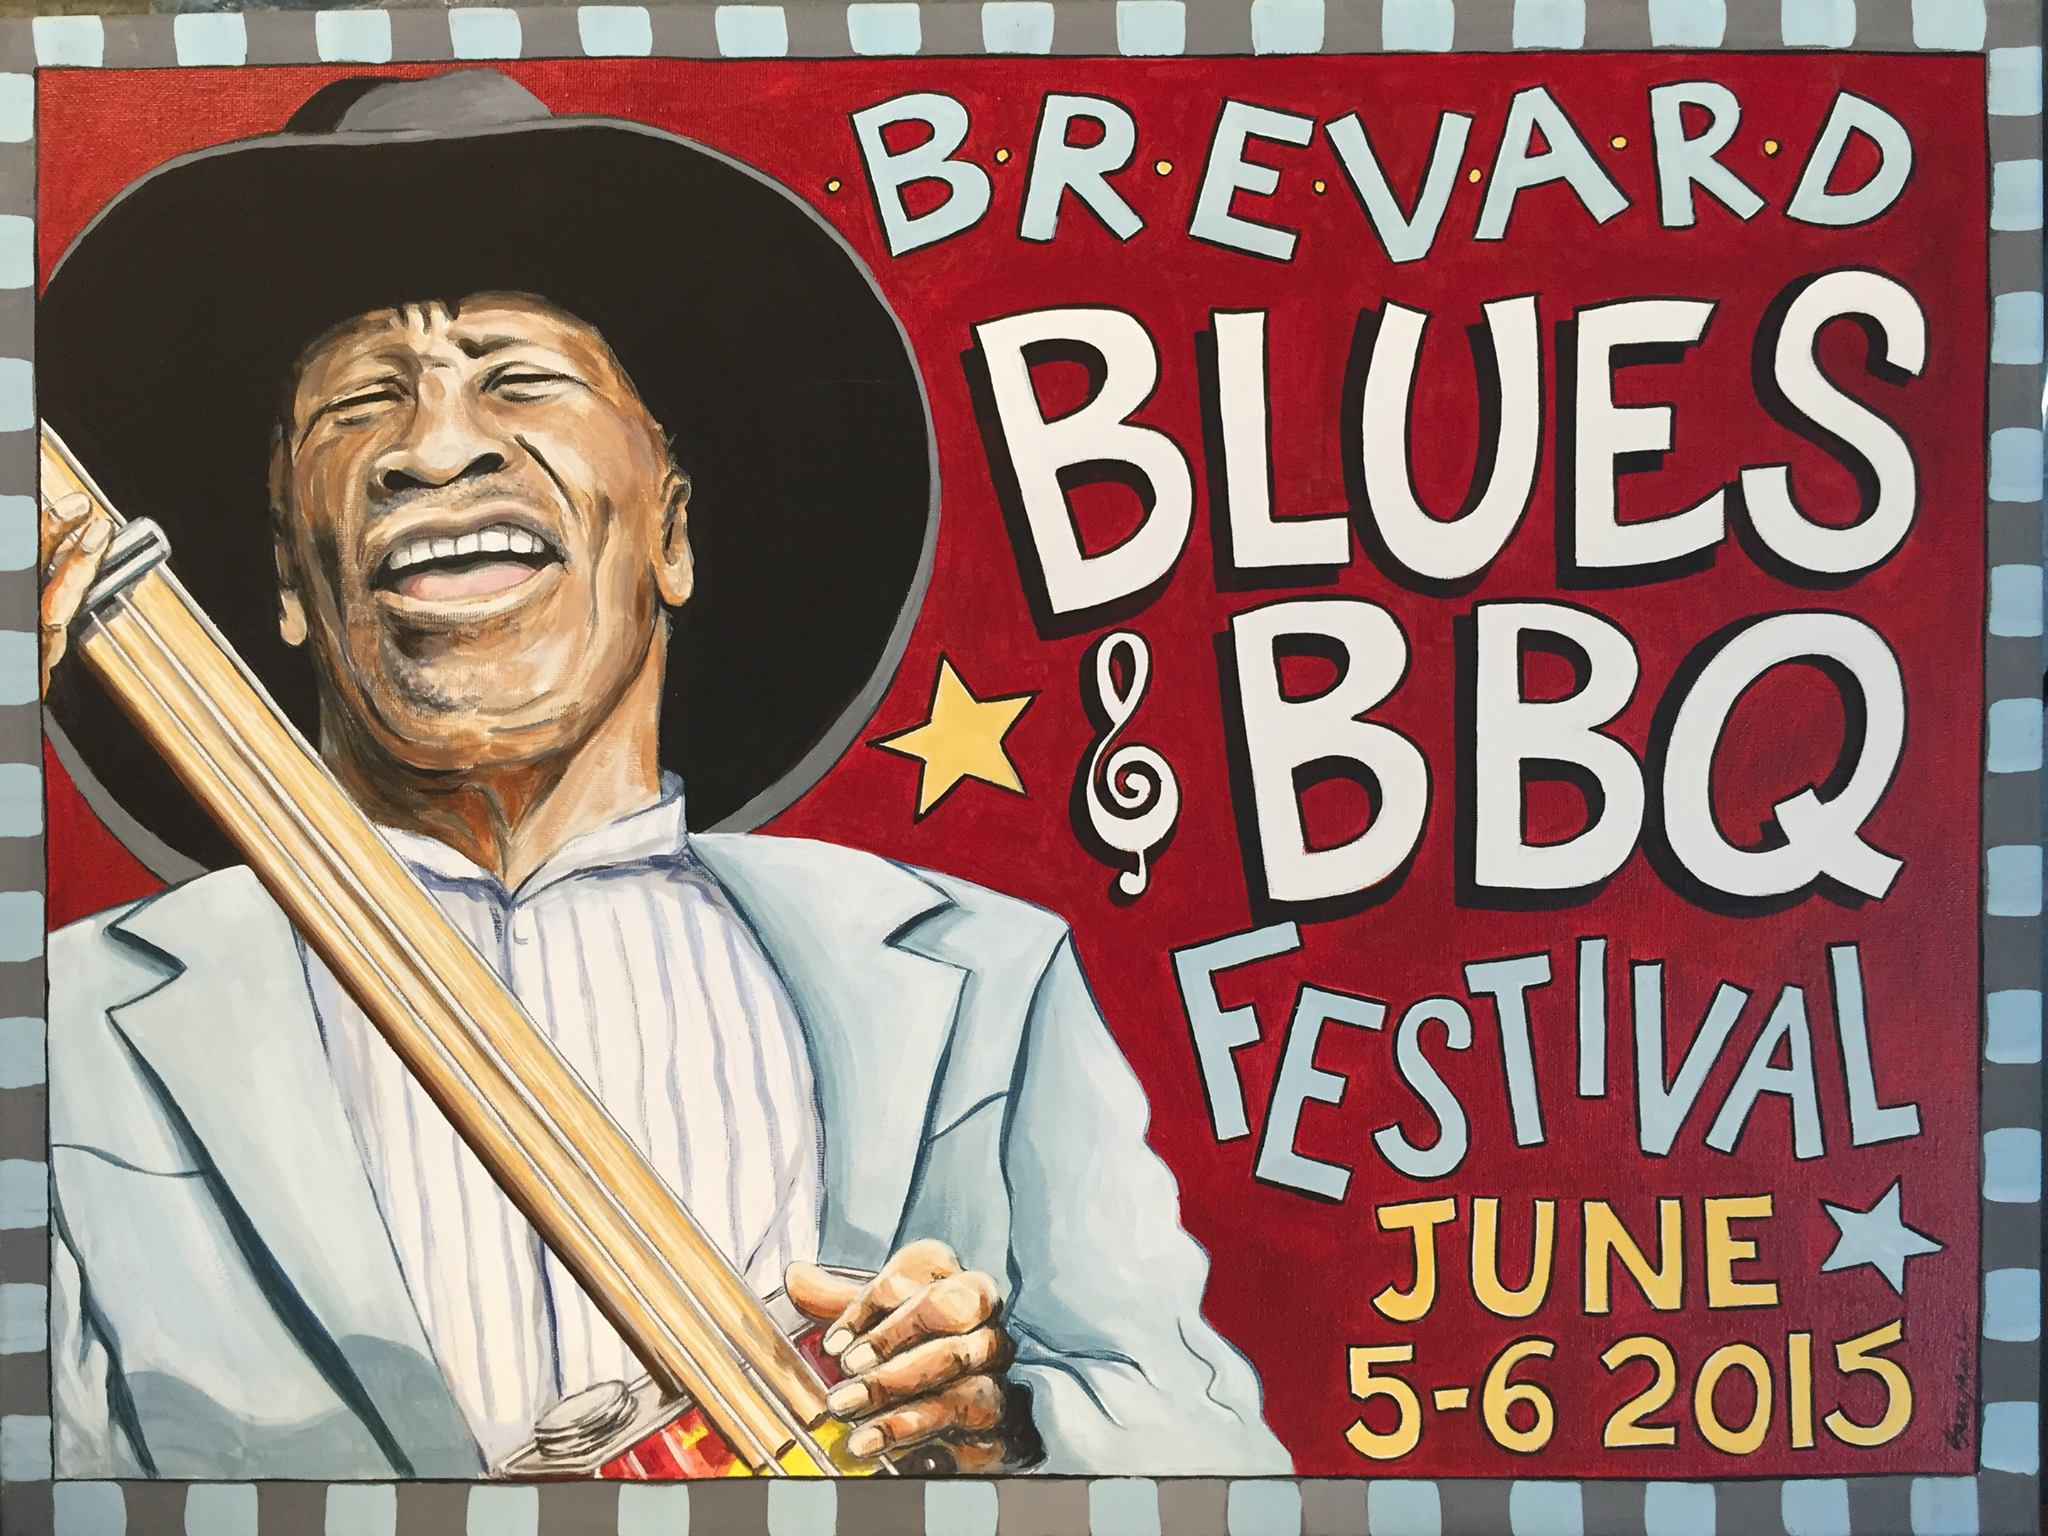 2015 - Brevard Blues Festival, NC